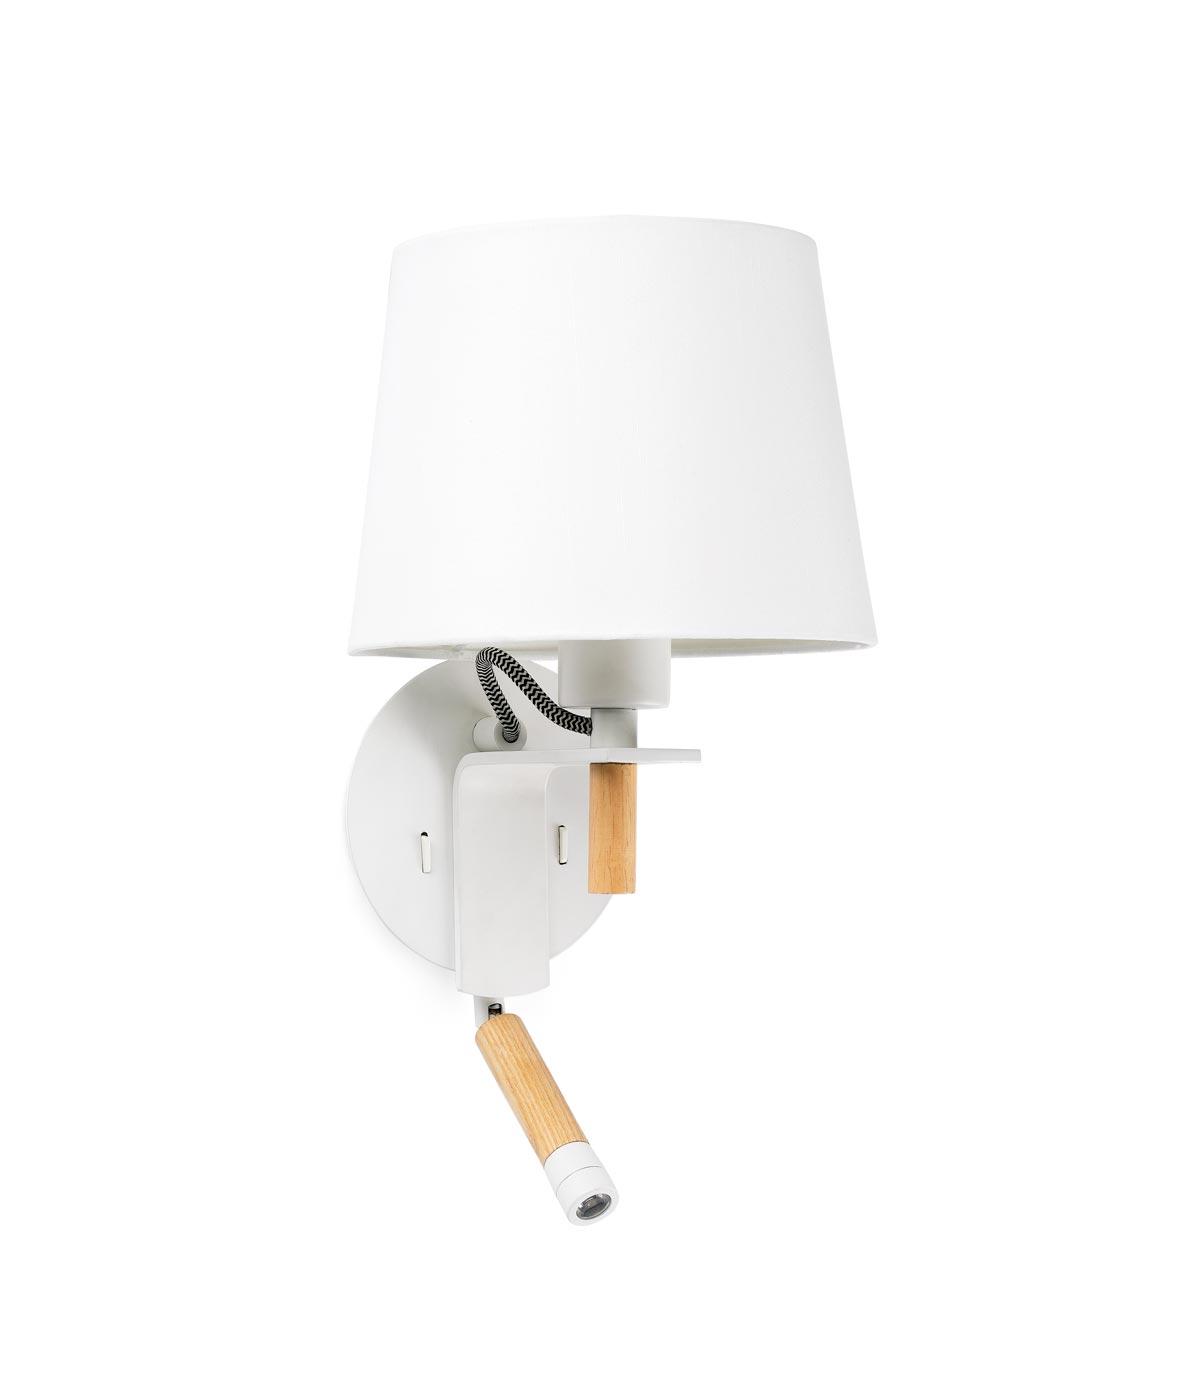 Aplique con lector LED FUSTA blanco